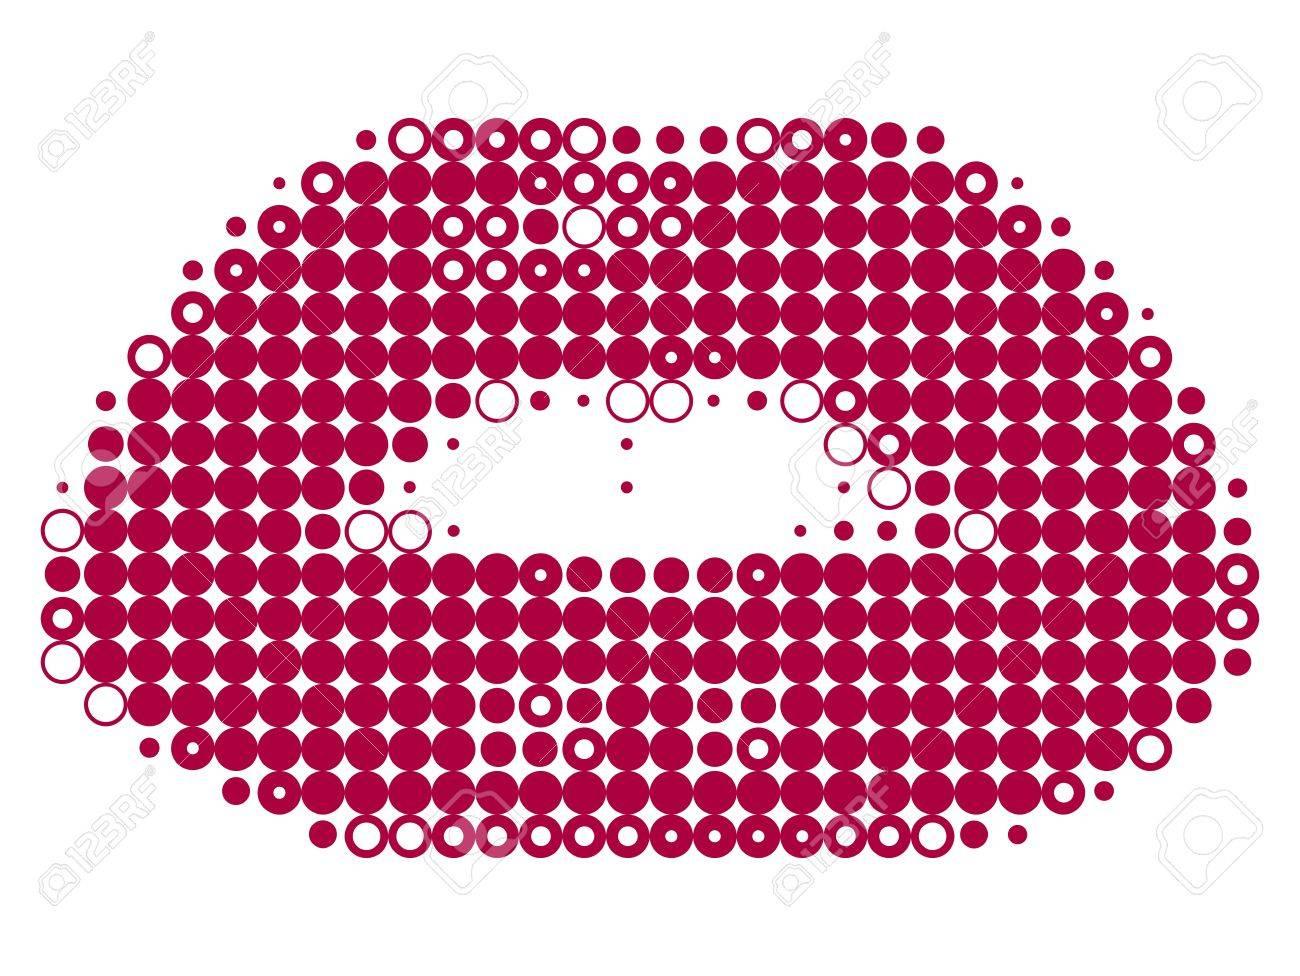 Pixelated female lips isolated on white vector illustration Stock Vector - 9134854